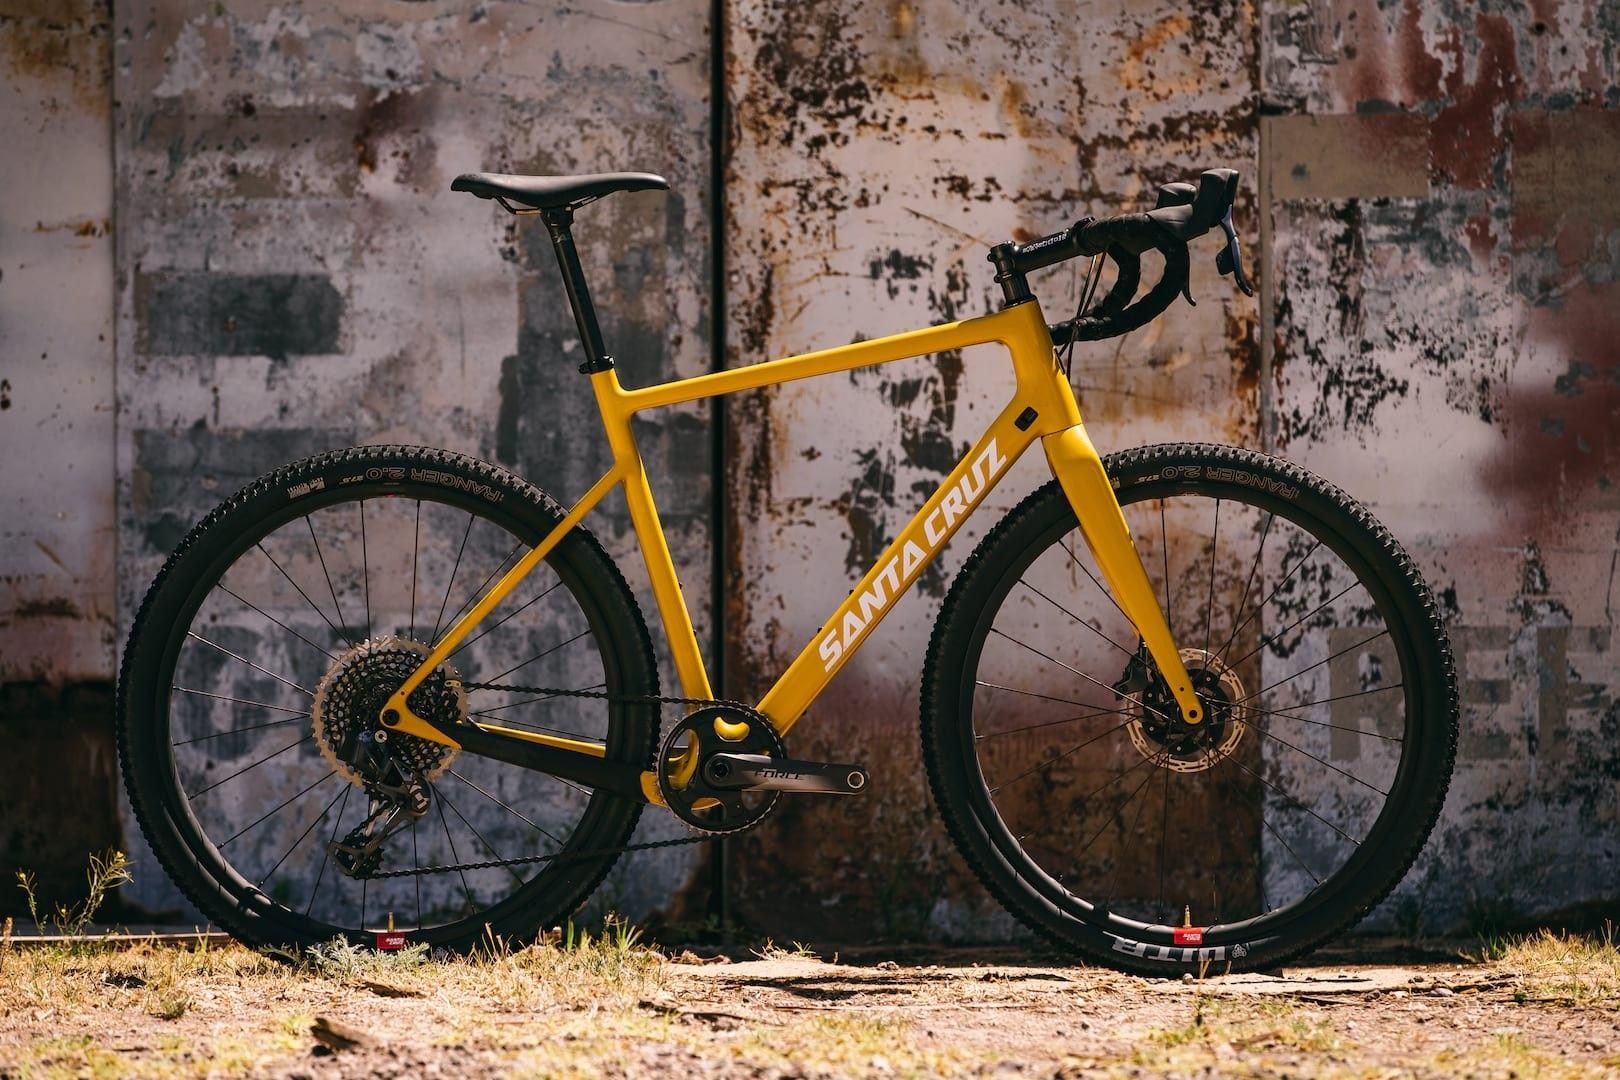 Épinglé par Halyson ferreira sur Ciclismo de montanha en 2020